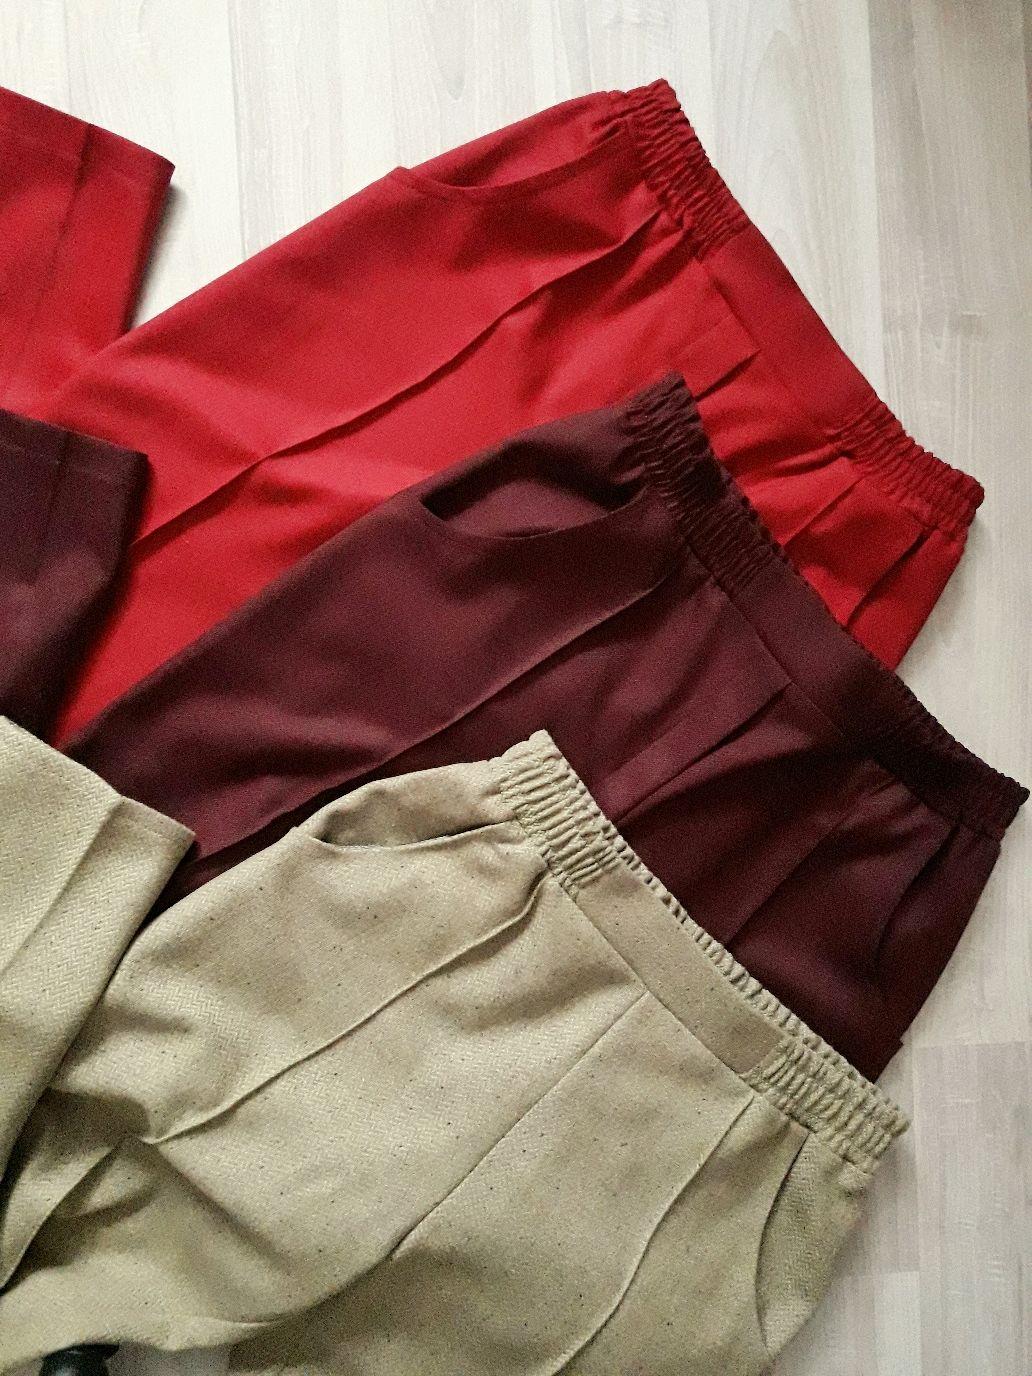 Теплые брюки, Брюки, Кобрин, Фото №1